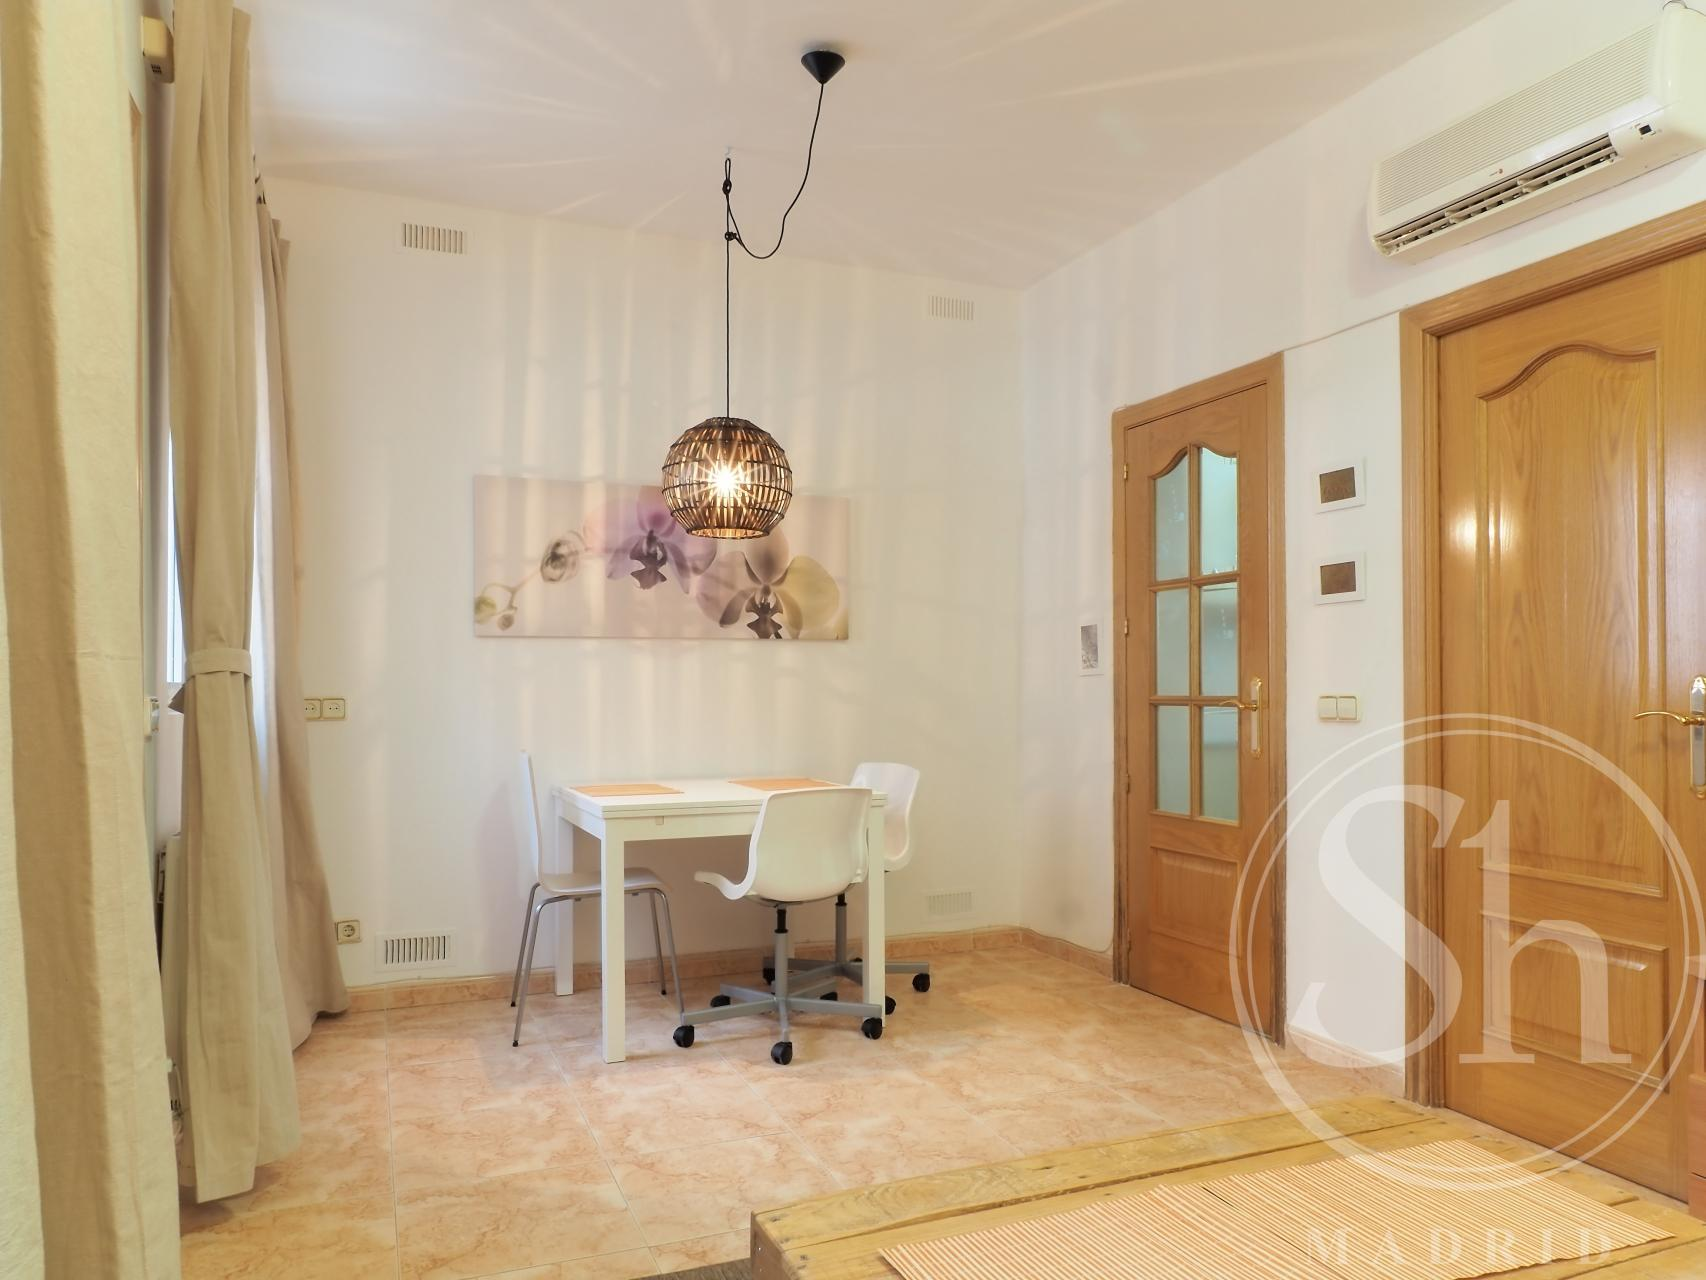 Apartment for Rent in Madrid Cuevas - Tetuán